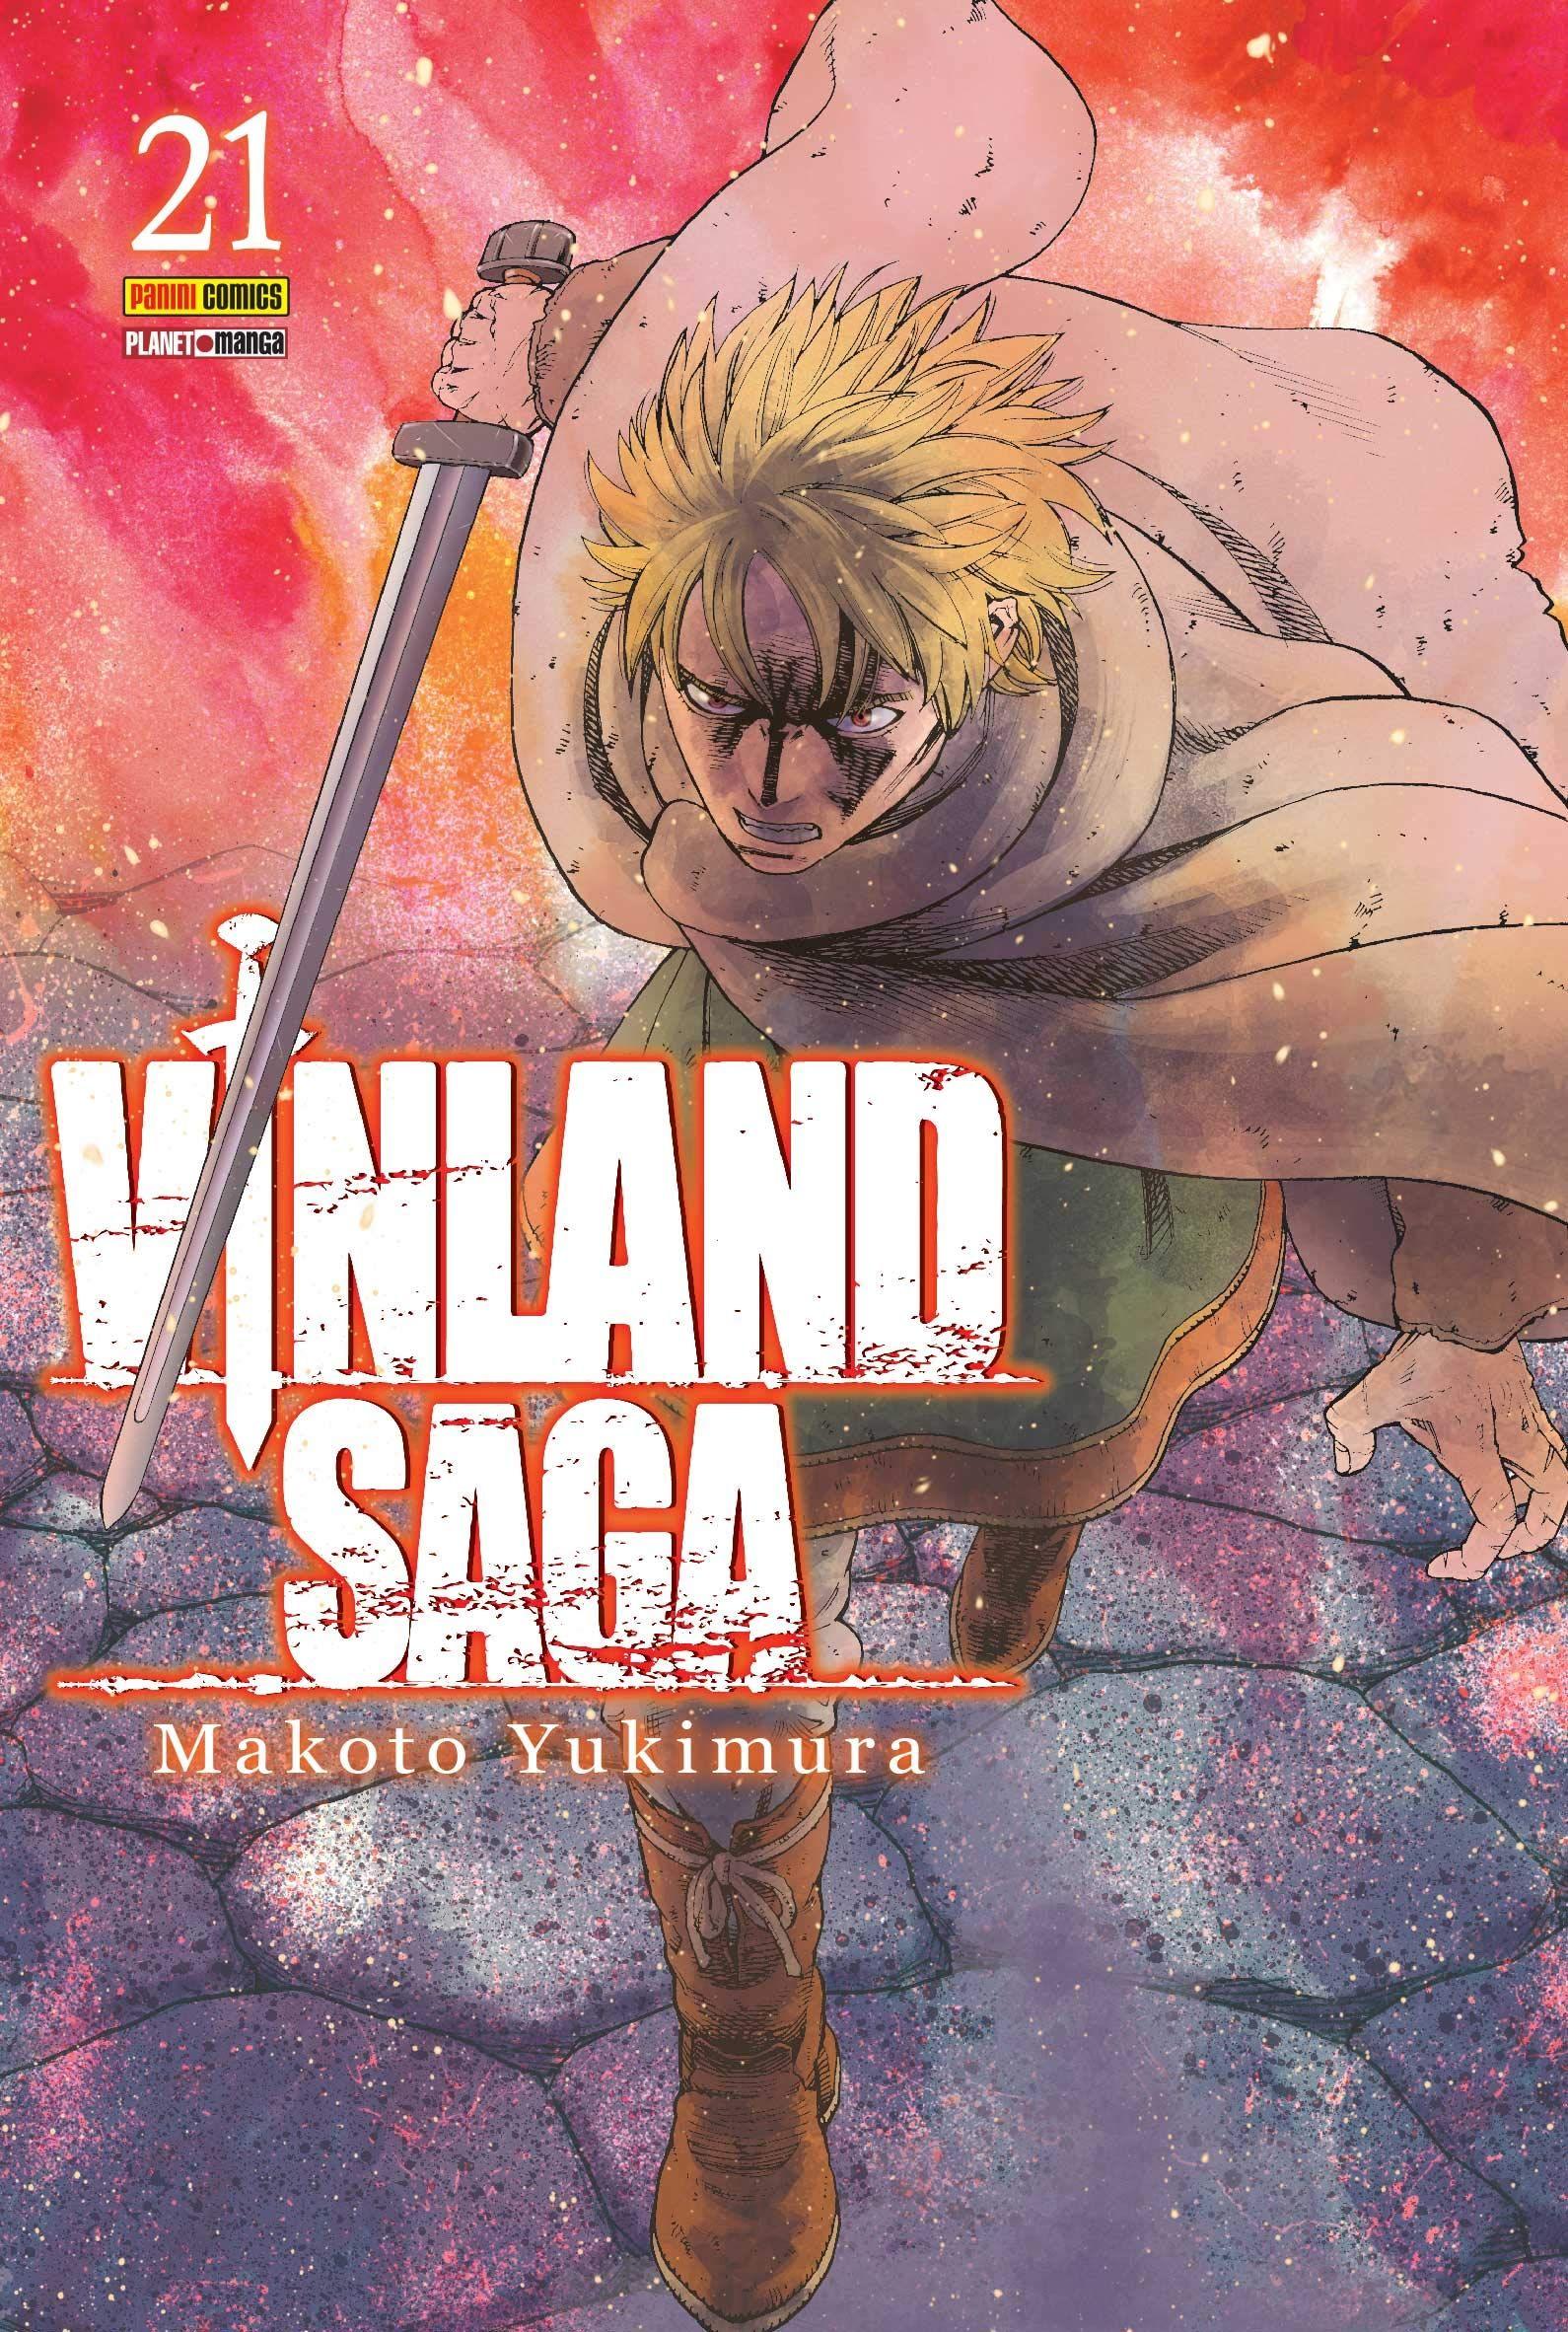 Vinland Saga Volume 11 Saga, Desenhos e Anime